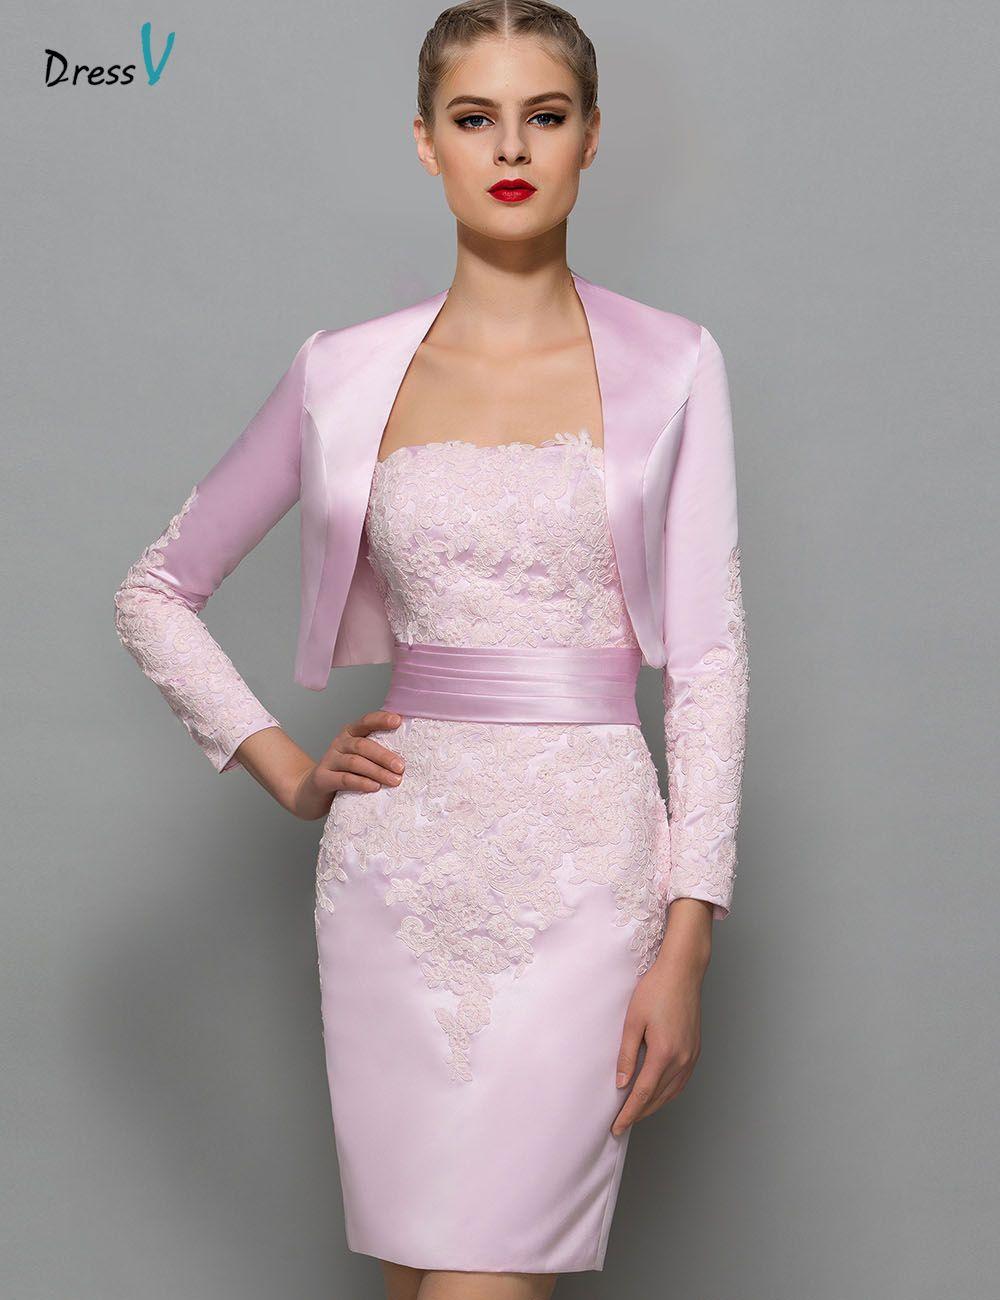 Dressv pink elegant sheath short mini mother of the bride dress strapless zipper up cocktail dress mother of the bride dress